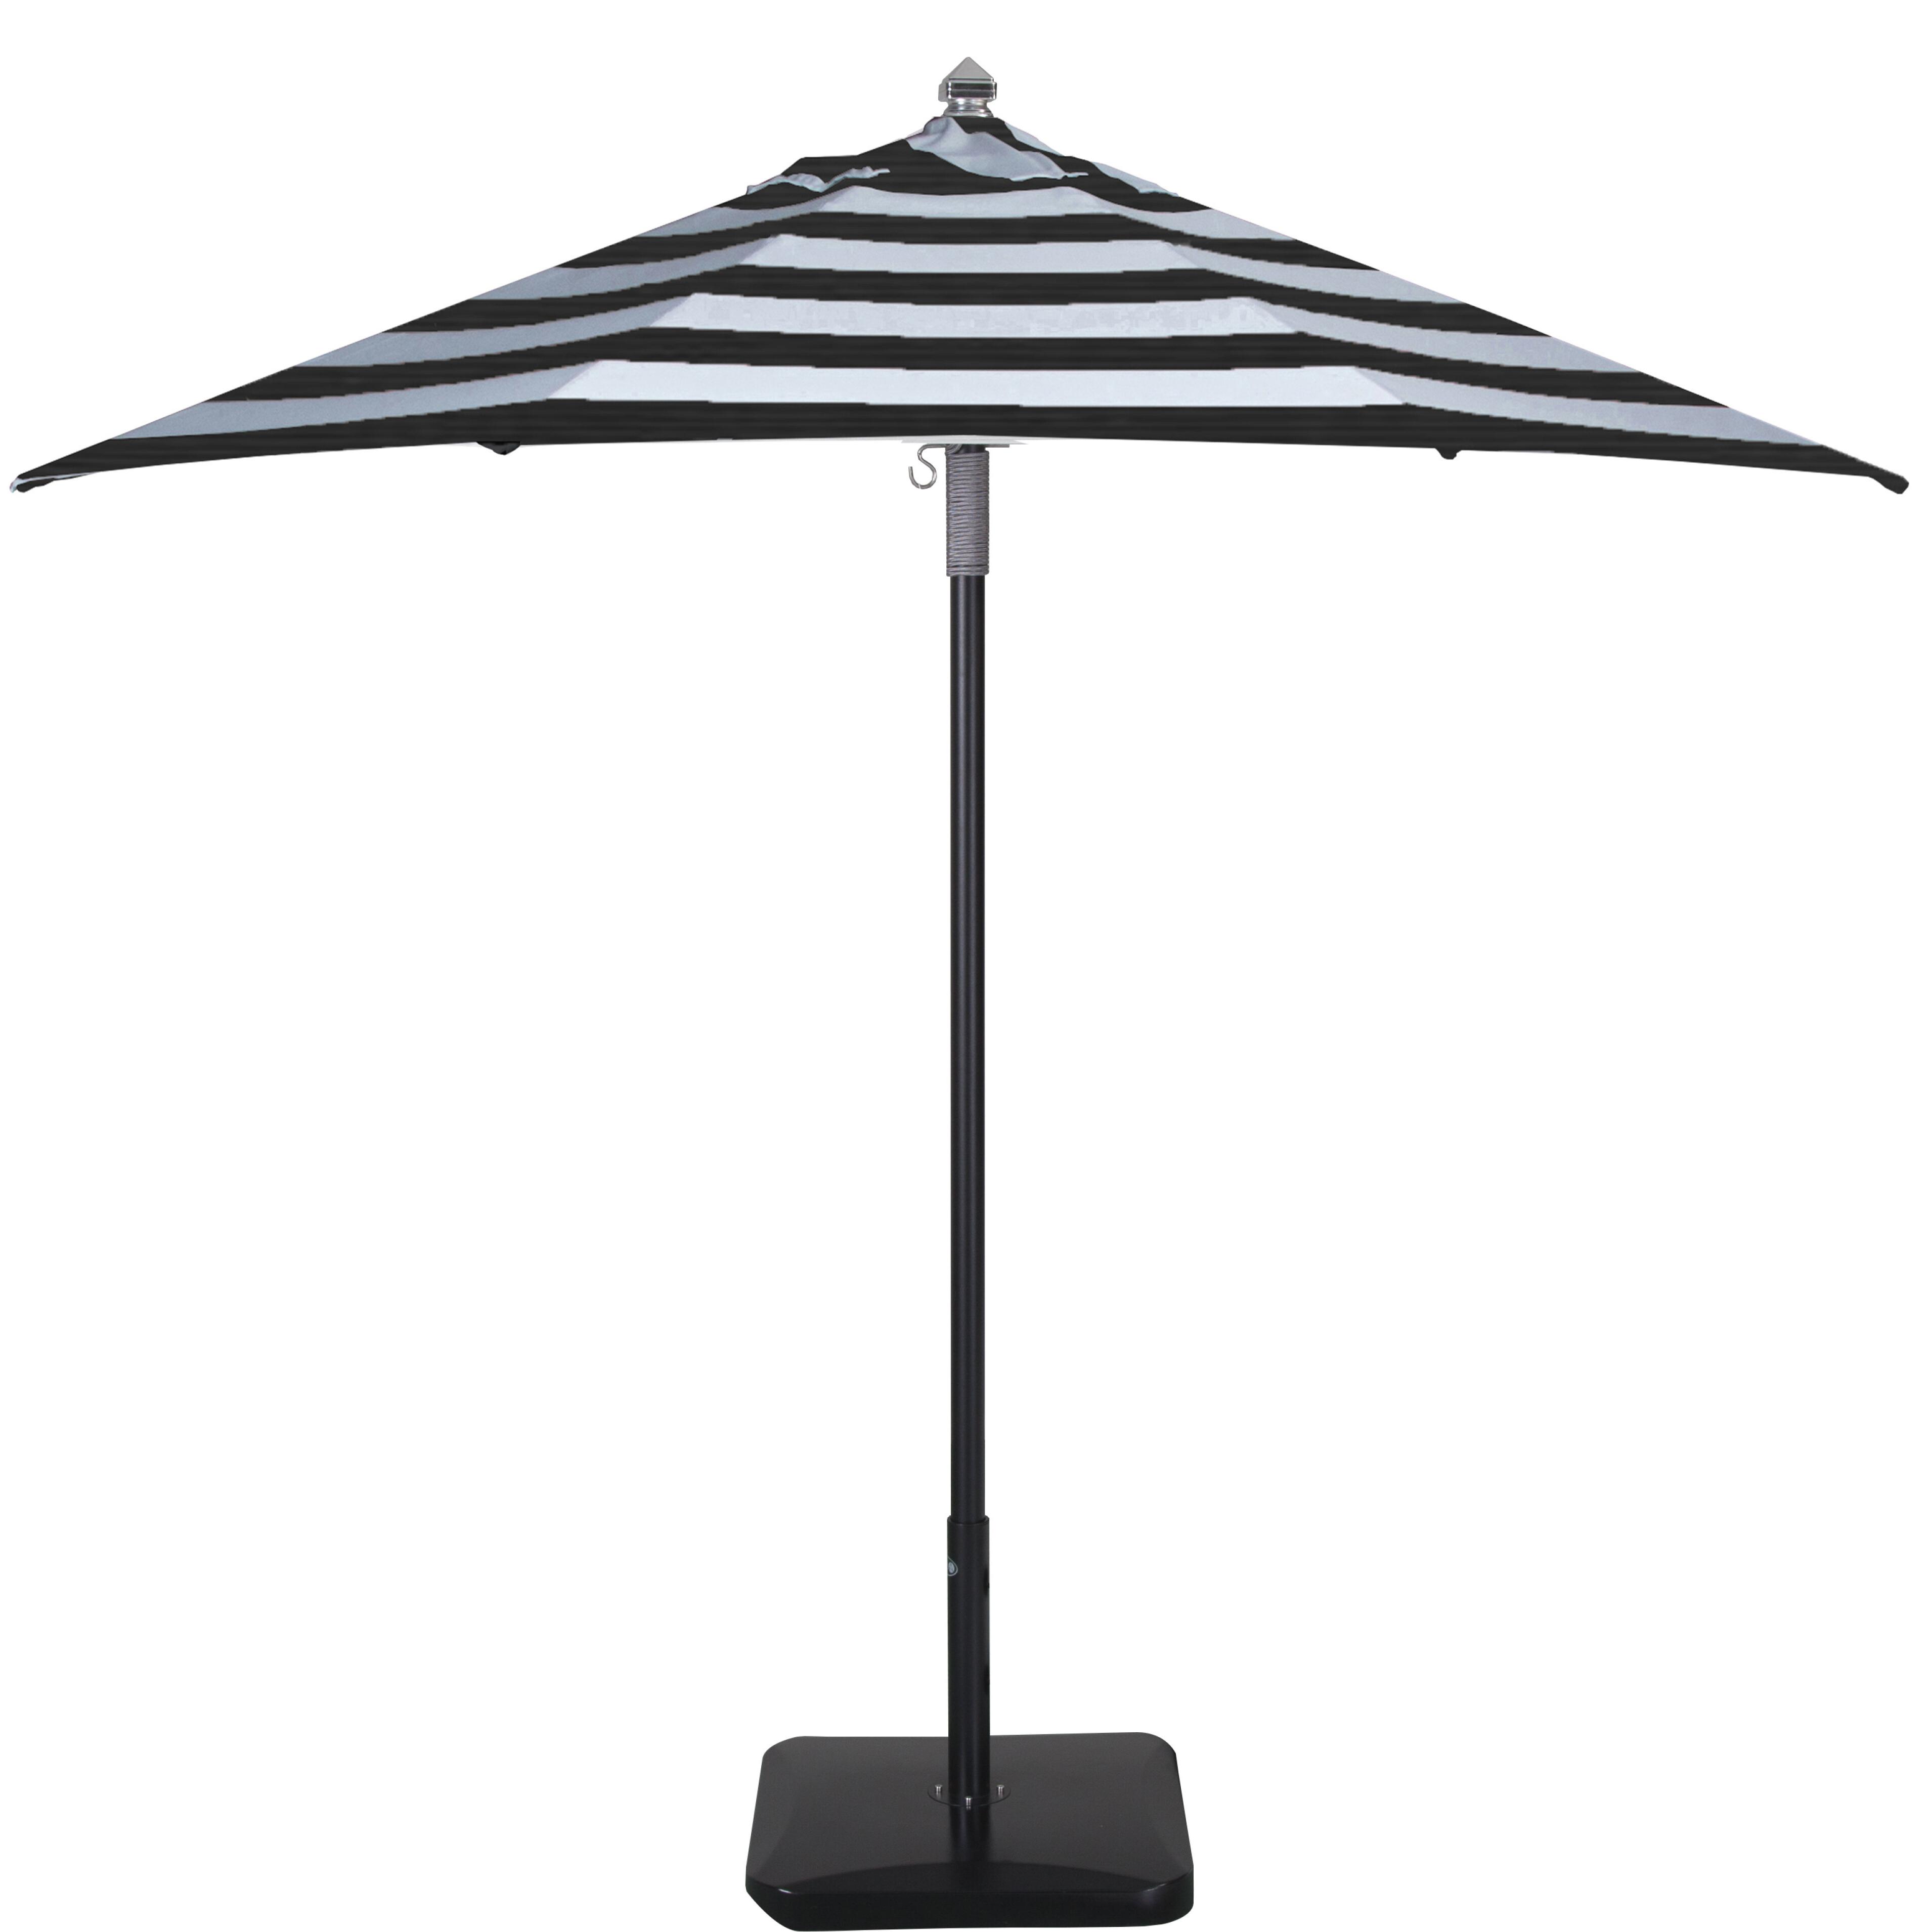 Latest Wallach Market Sunbrella Umbrellas With Regard To Centeno 9' Market Sunbrella Umbrella (View 20 of 20)